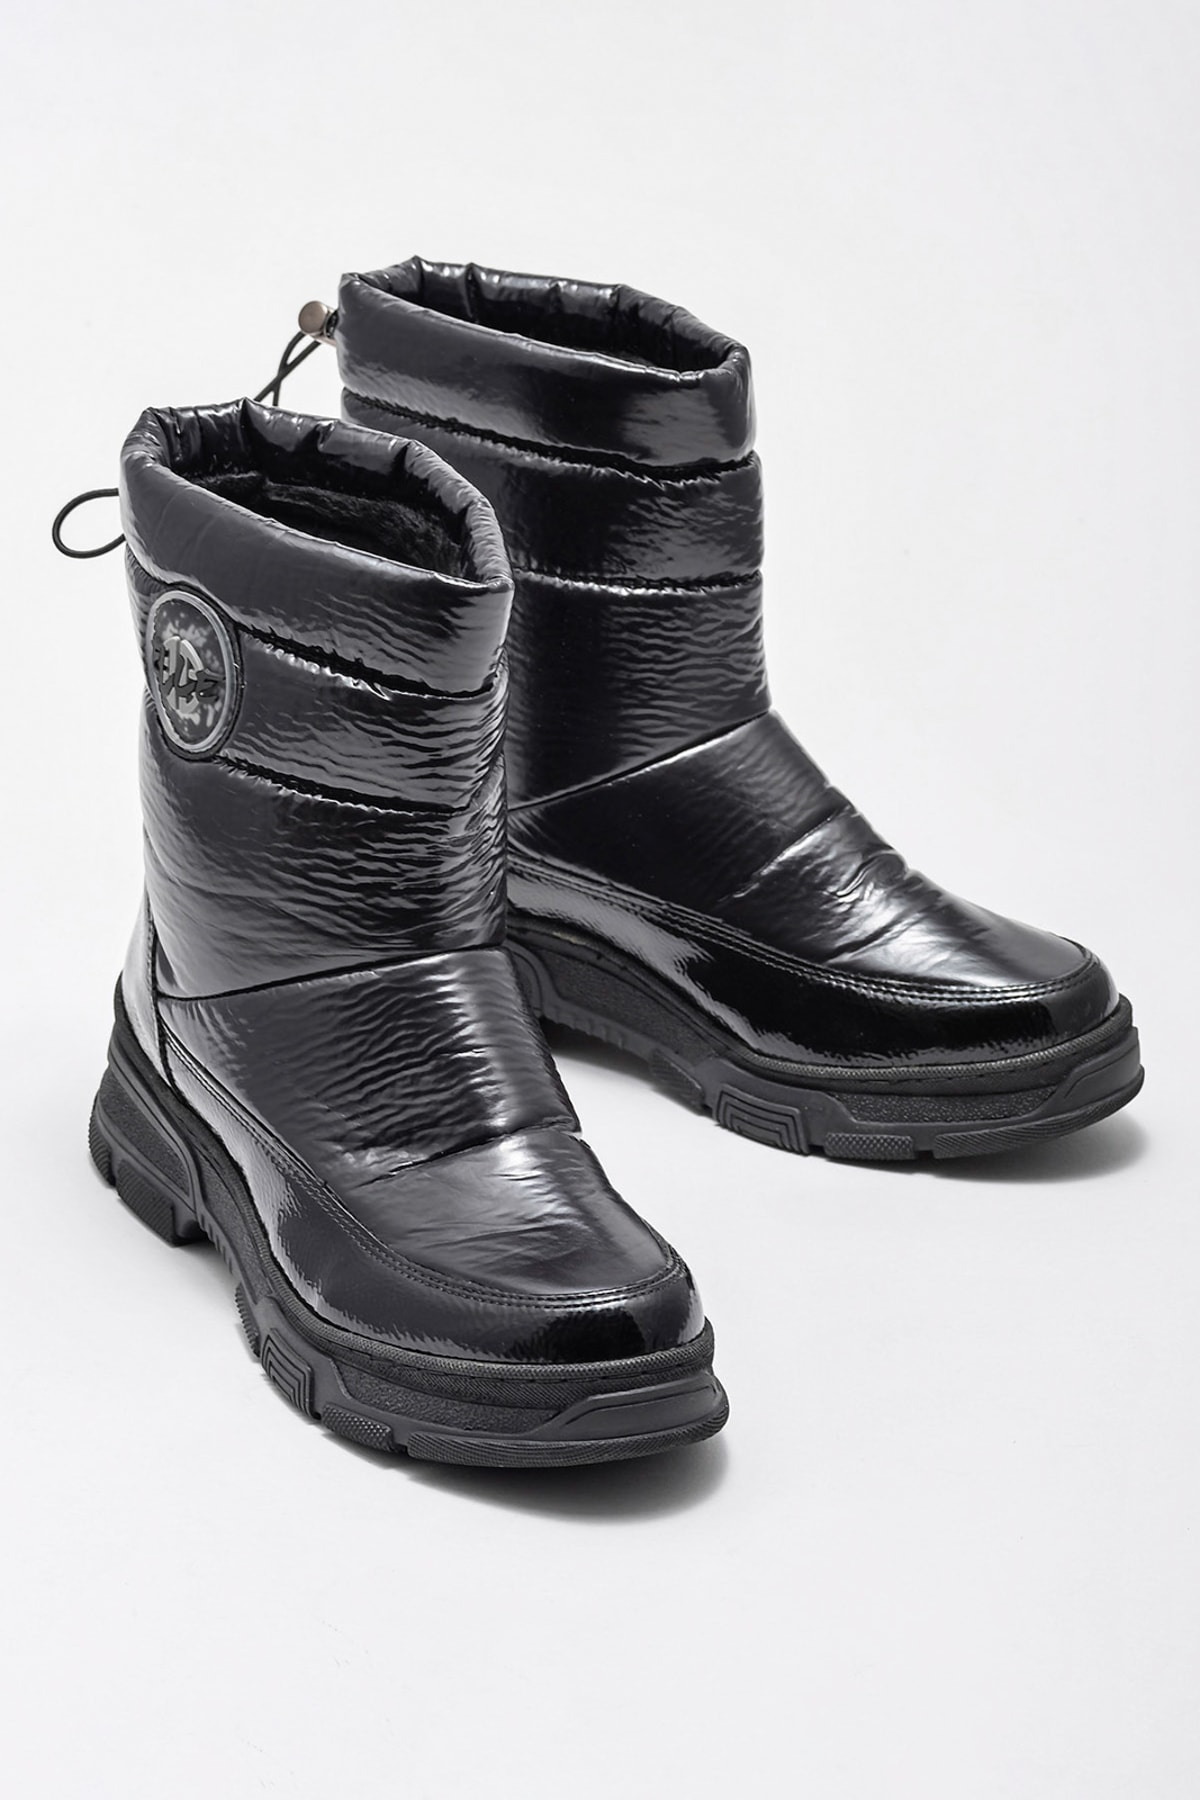 Elle Shoes Kadın Petula Sıyah Bot & Bootie 20KAYMB103 2